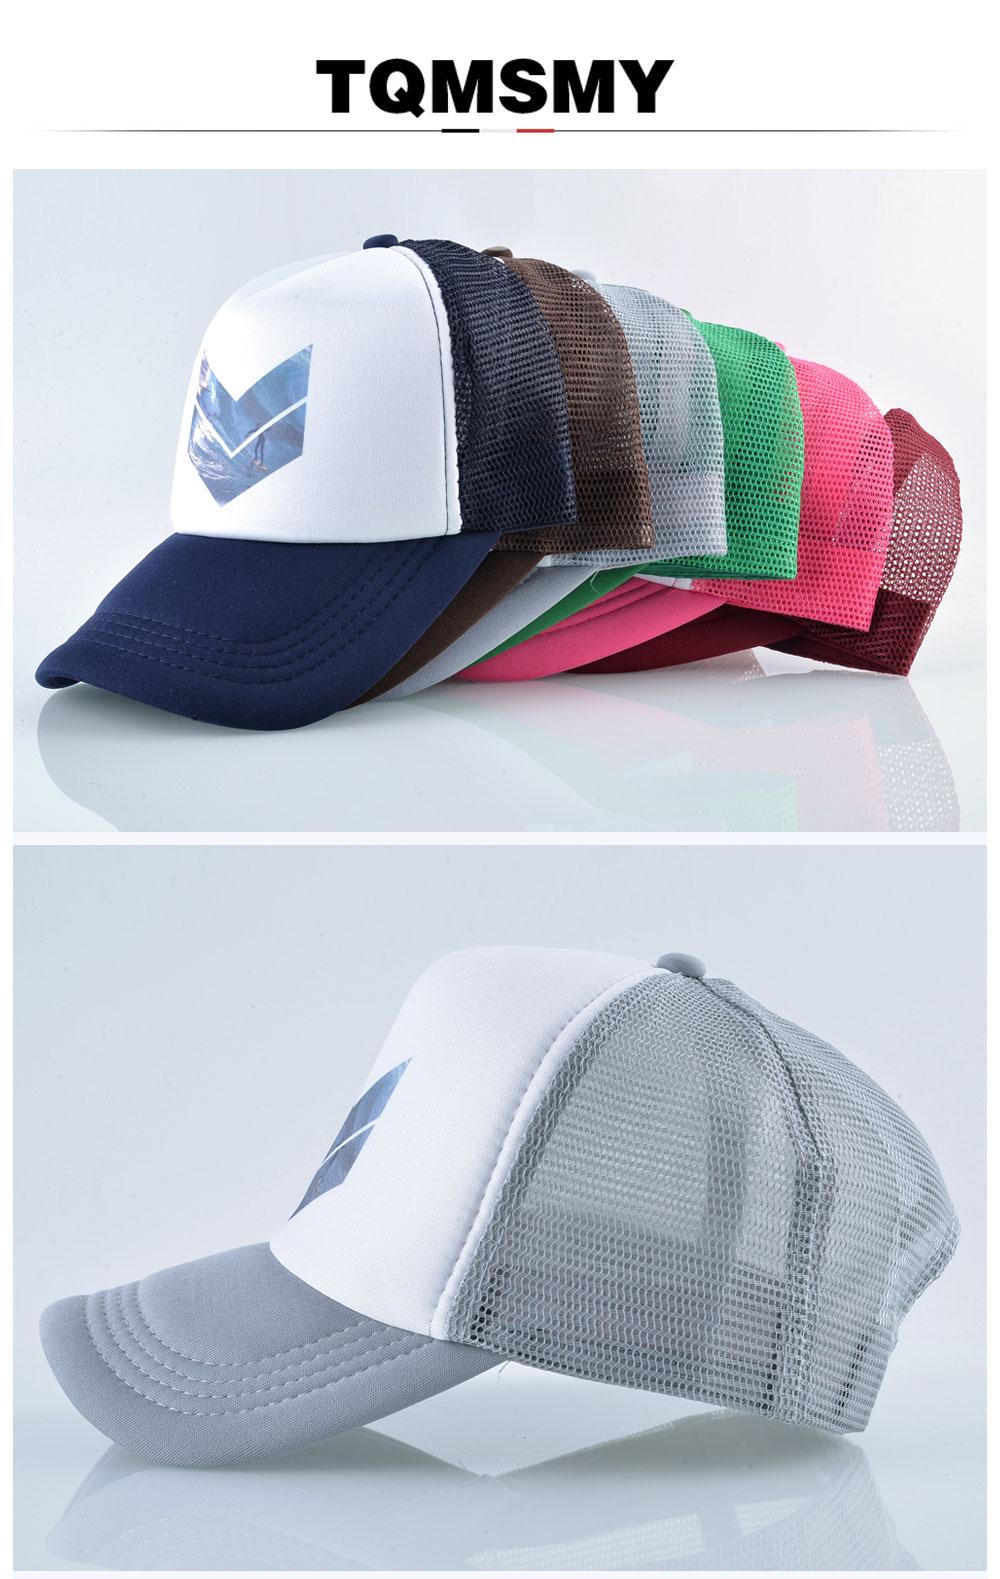 Unisex bone Skull pattern Baseball cap men Hip Hop caps women Snapback Caps  Breathable mesh sun hats for women s CasquetteUSD 4.99 piece 420bddd2d8a6